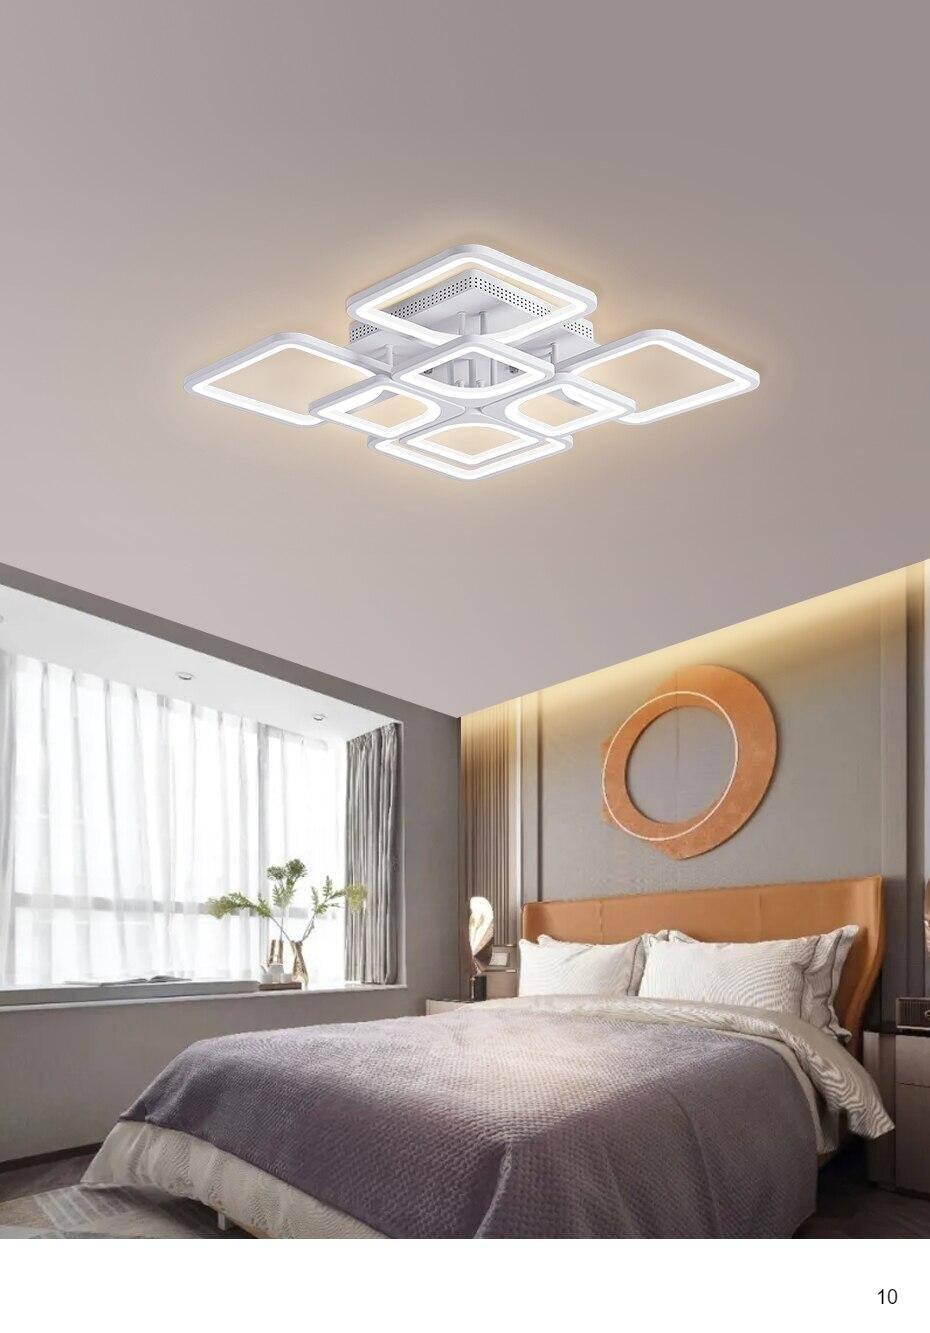 Beautiful design of LED Chandelier white lights, example show case of bedroom led lighting